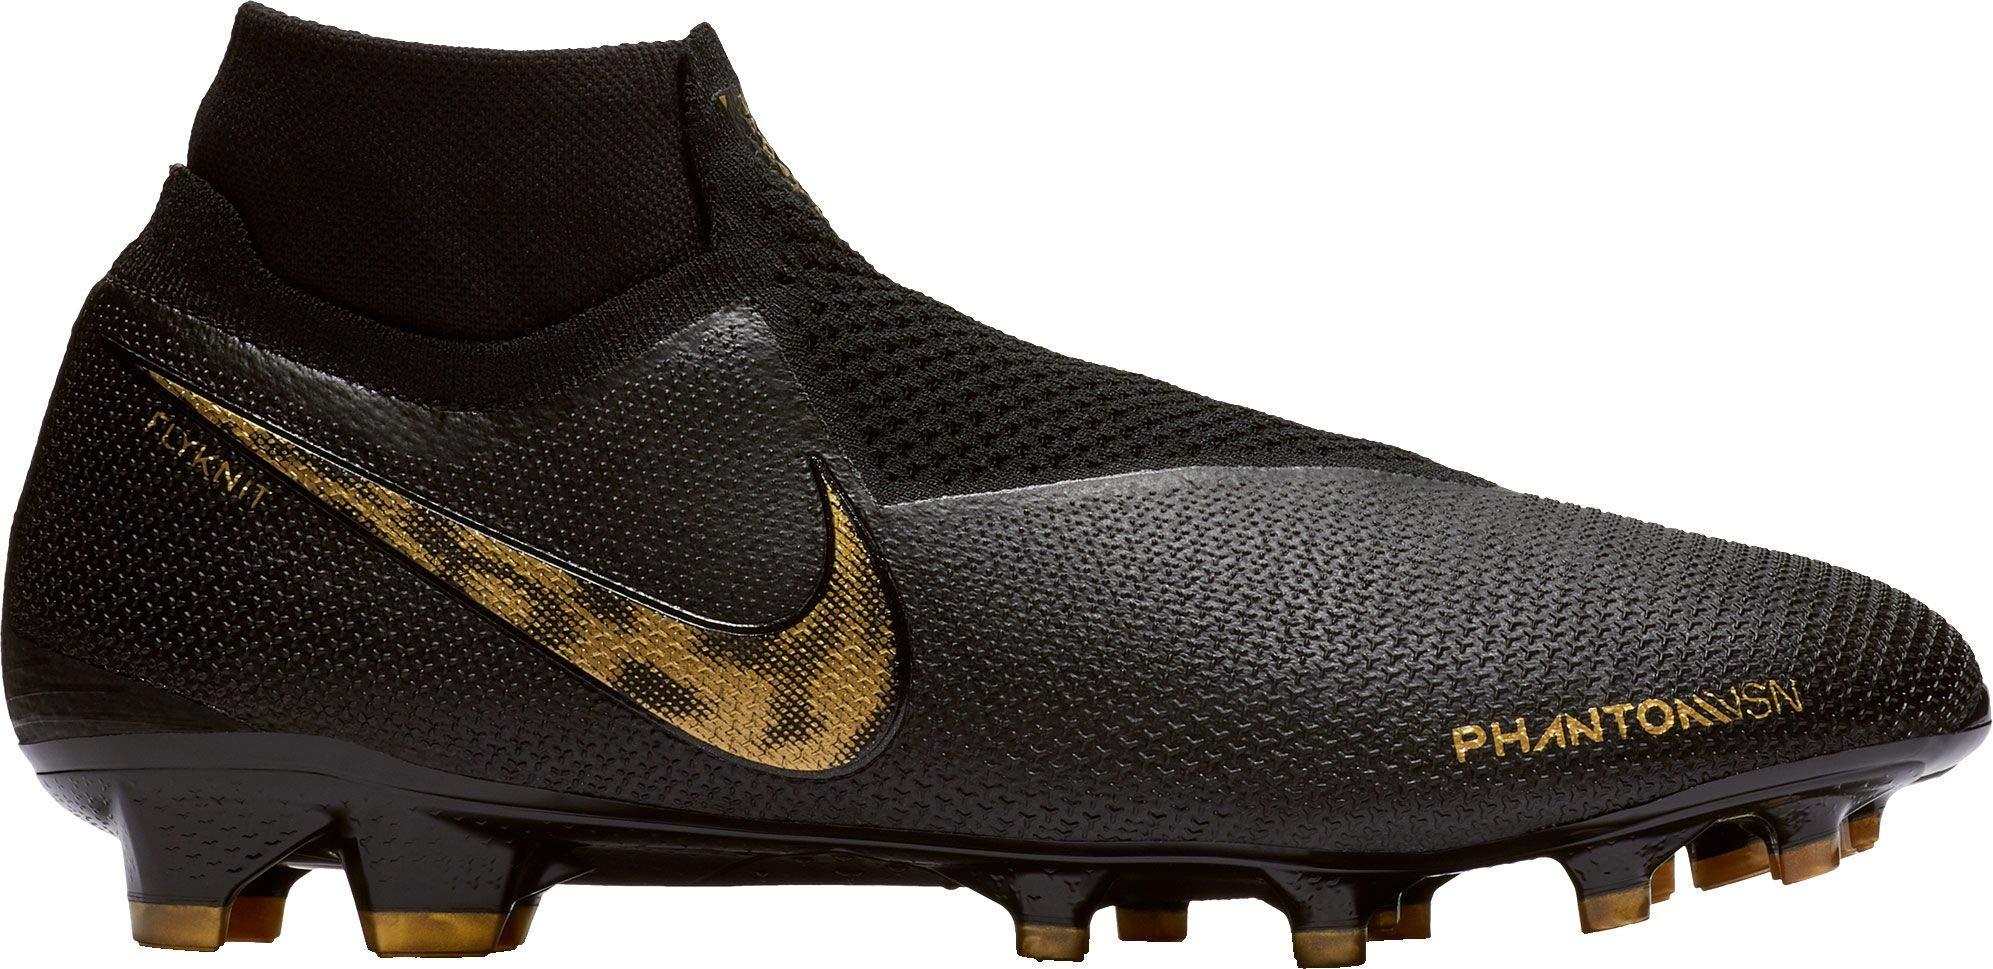 Nike Phantom Vision Elite Dynamic Fit FG Soccer Cleats(Black/Gold,M5W65,Medium)